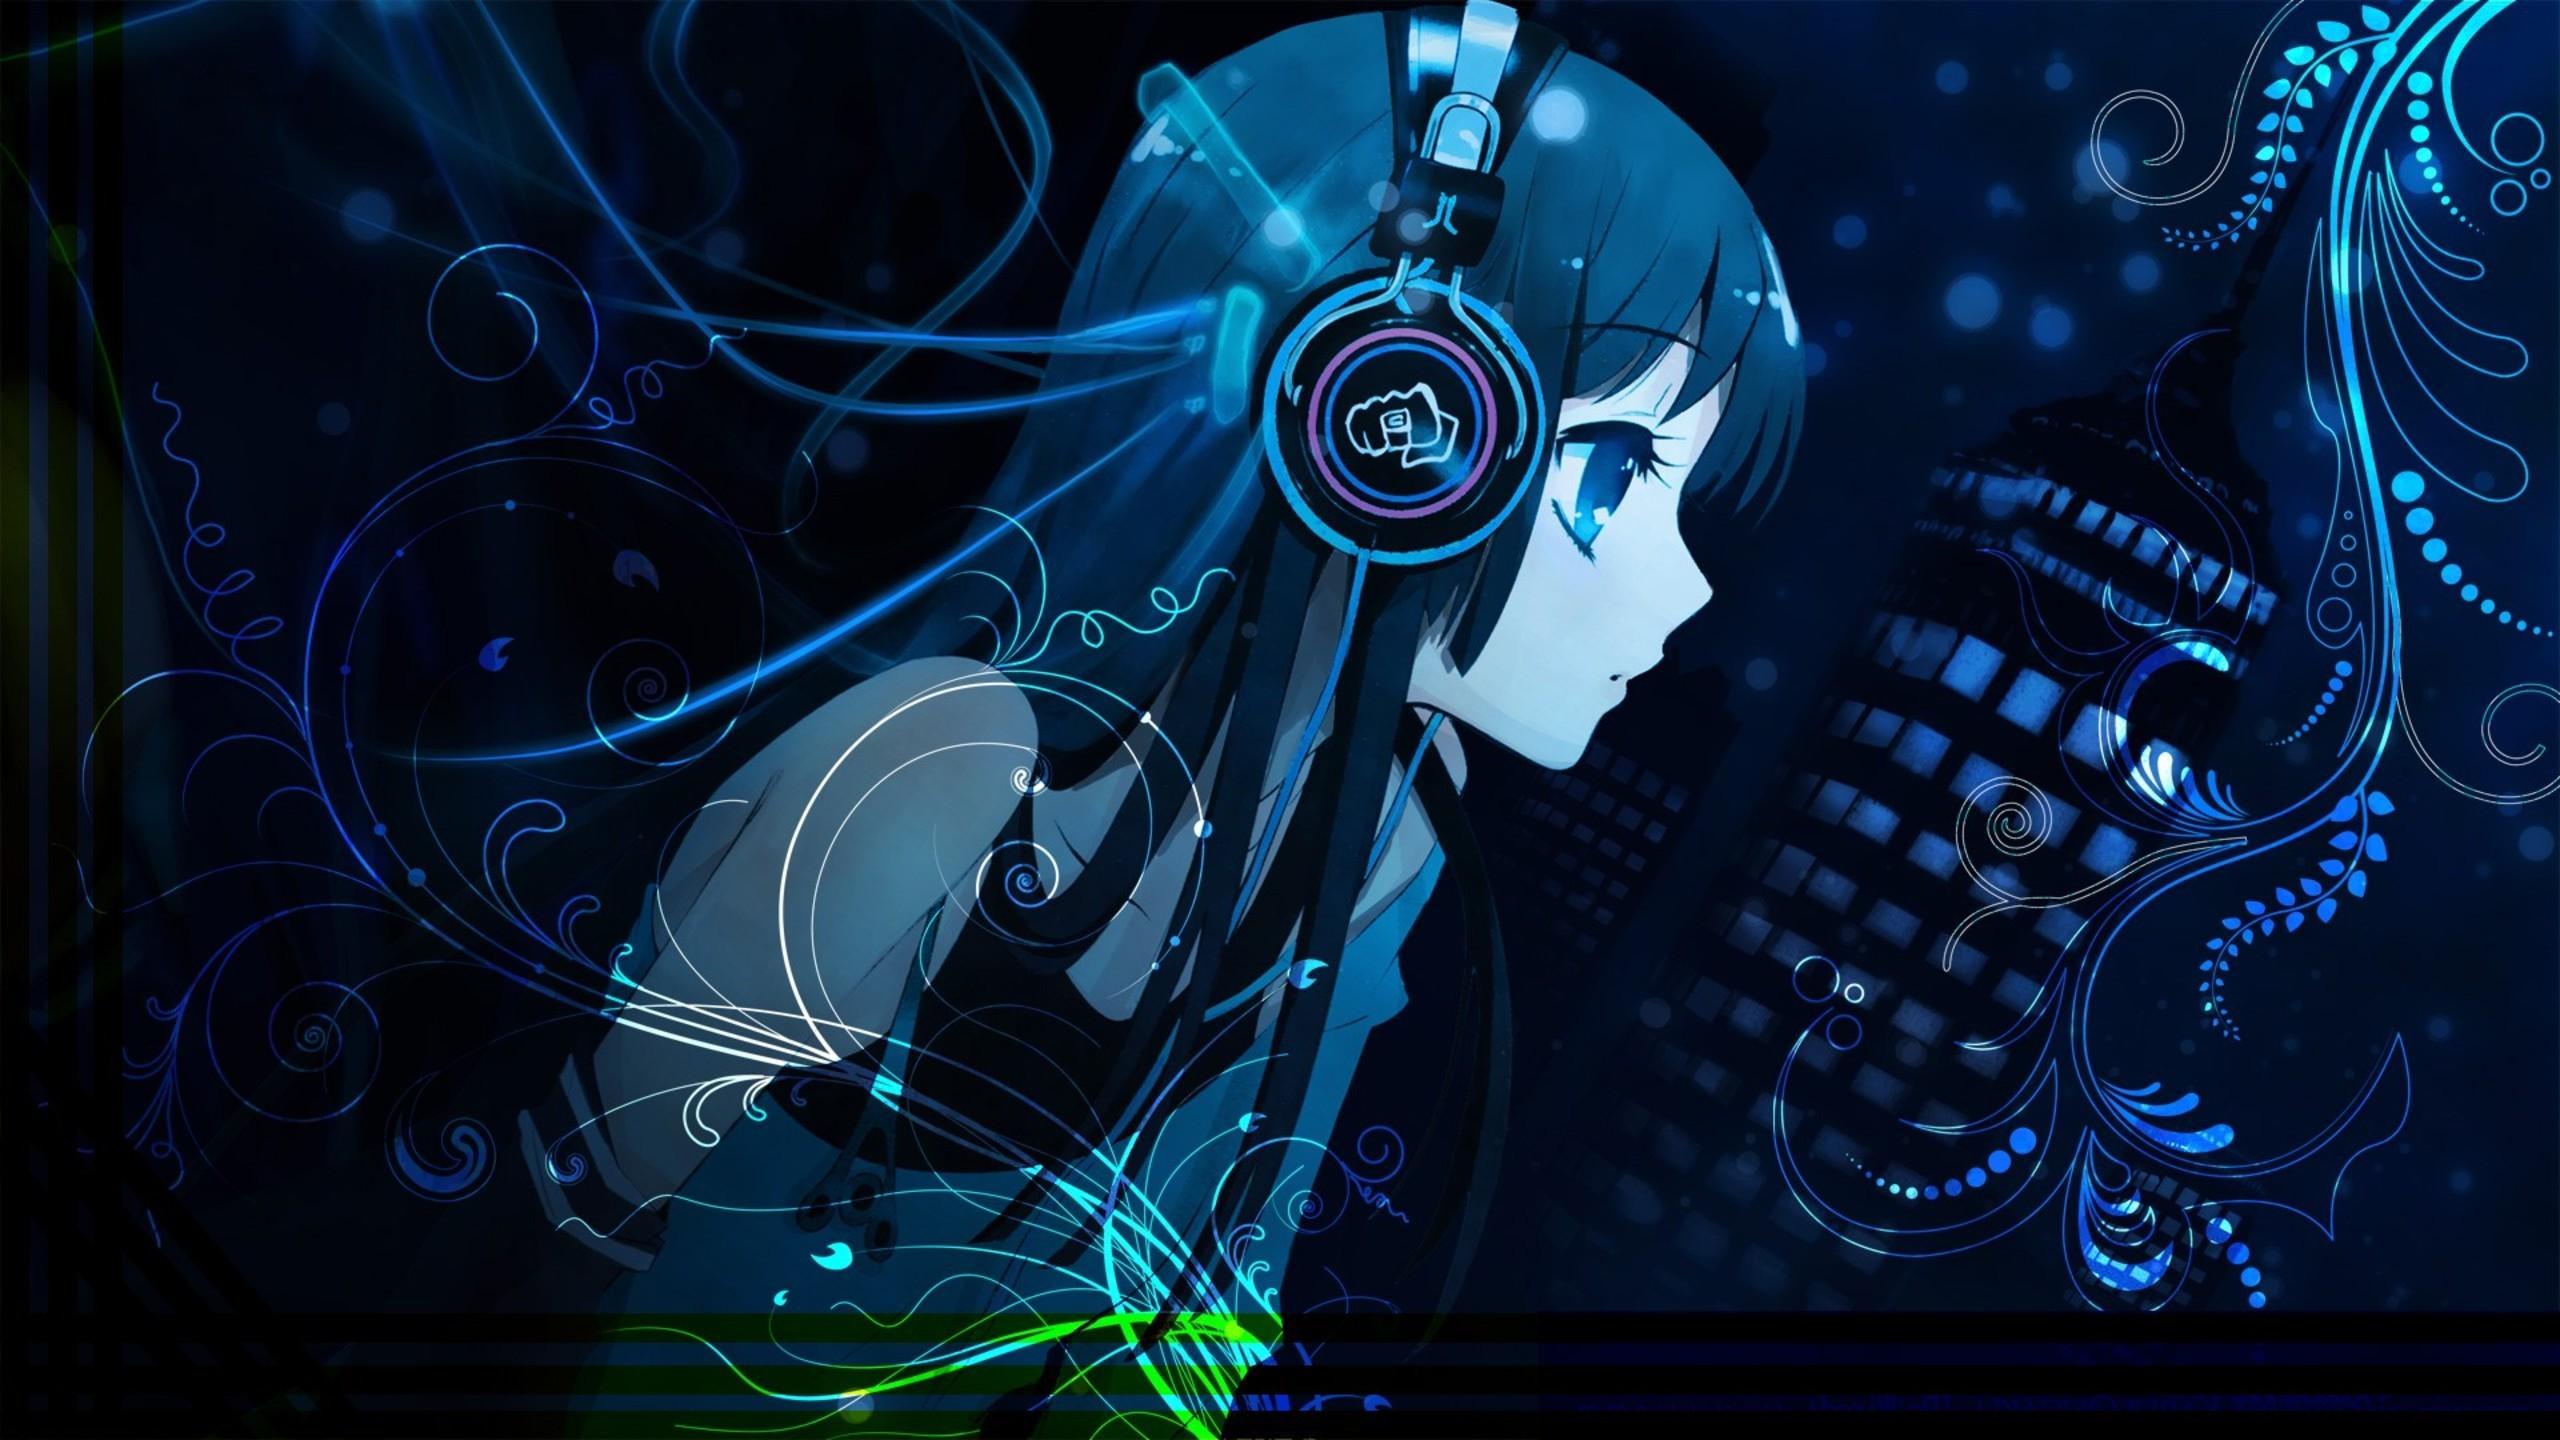 Kiss Wallpaper Boy And Girl Anime Music Wallpaper 77 Images